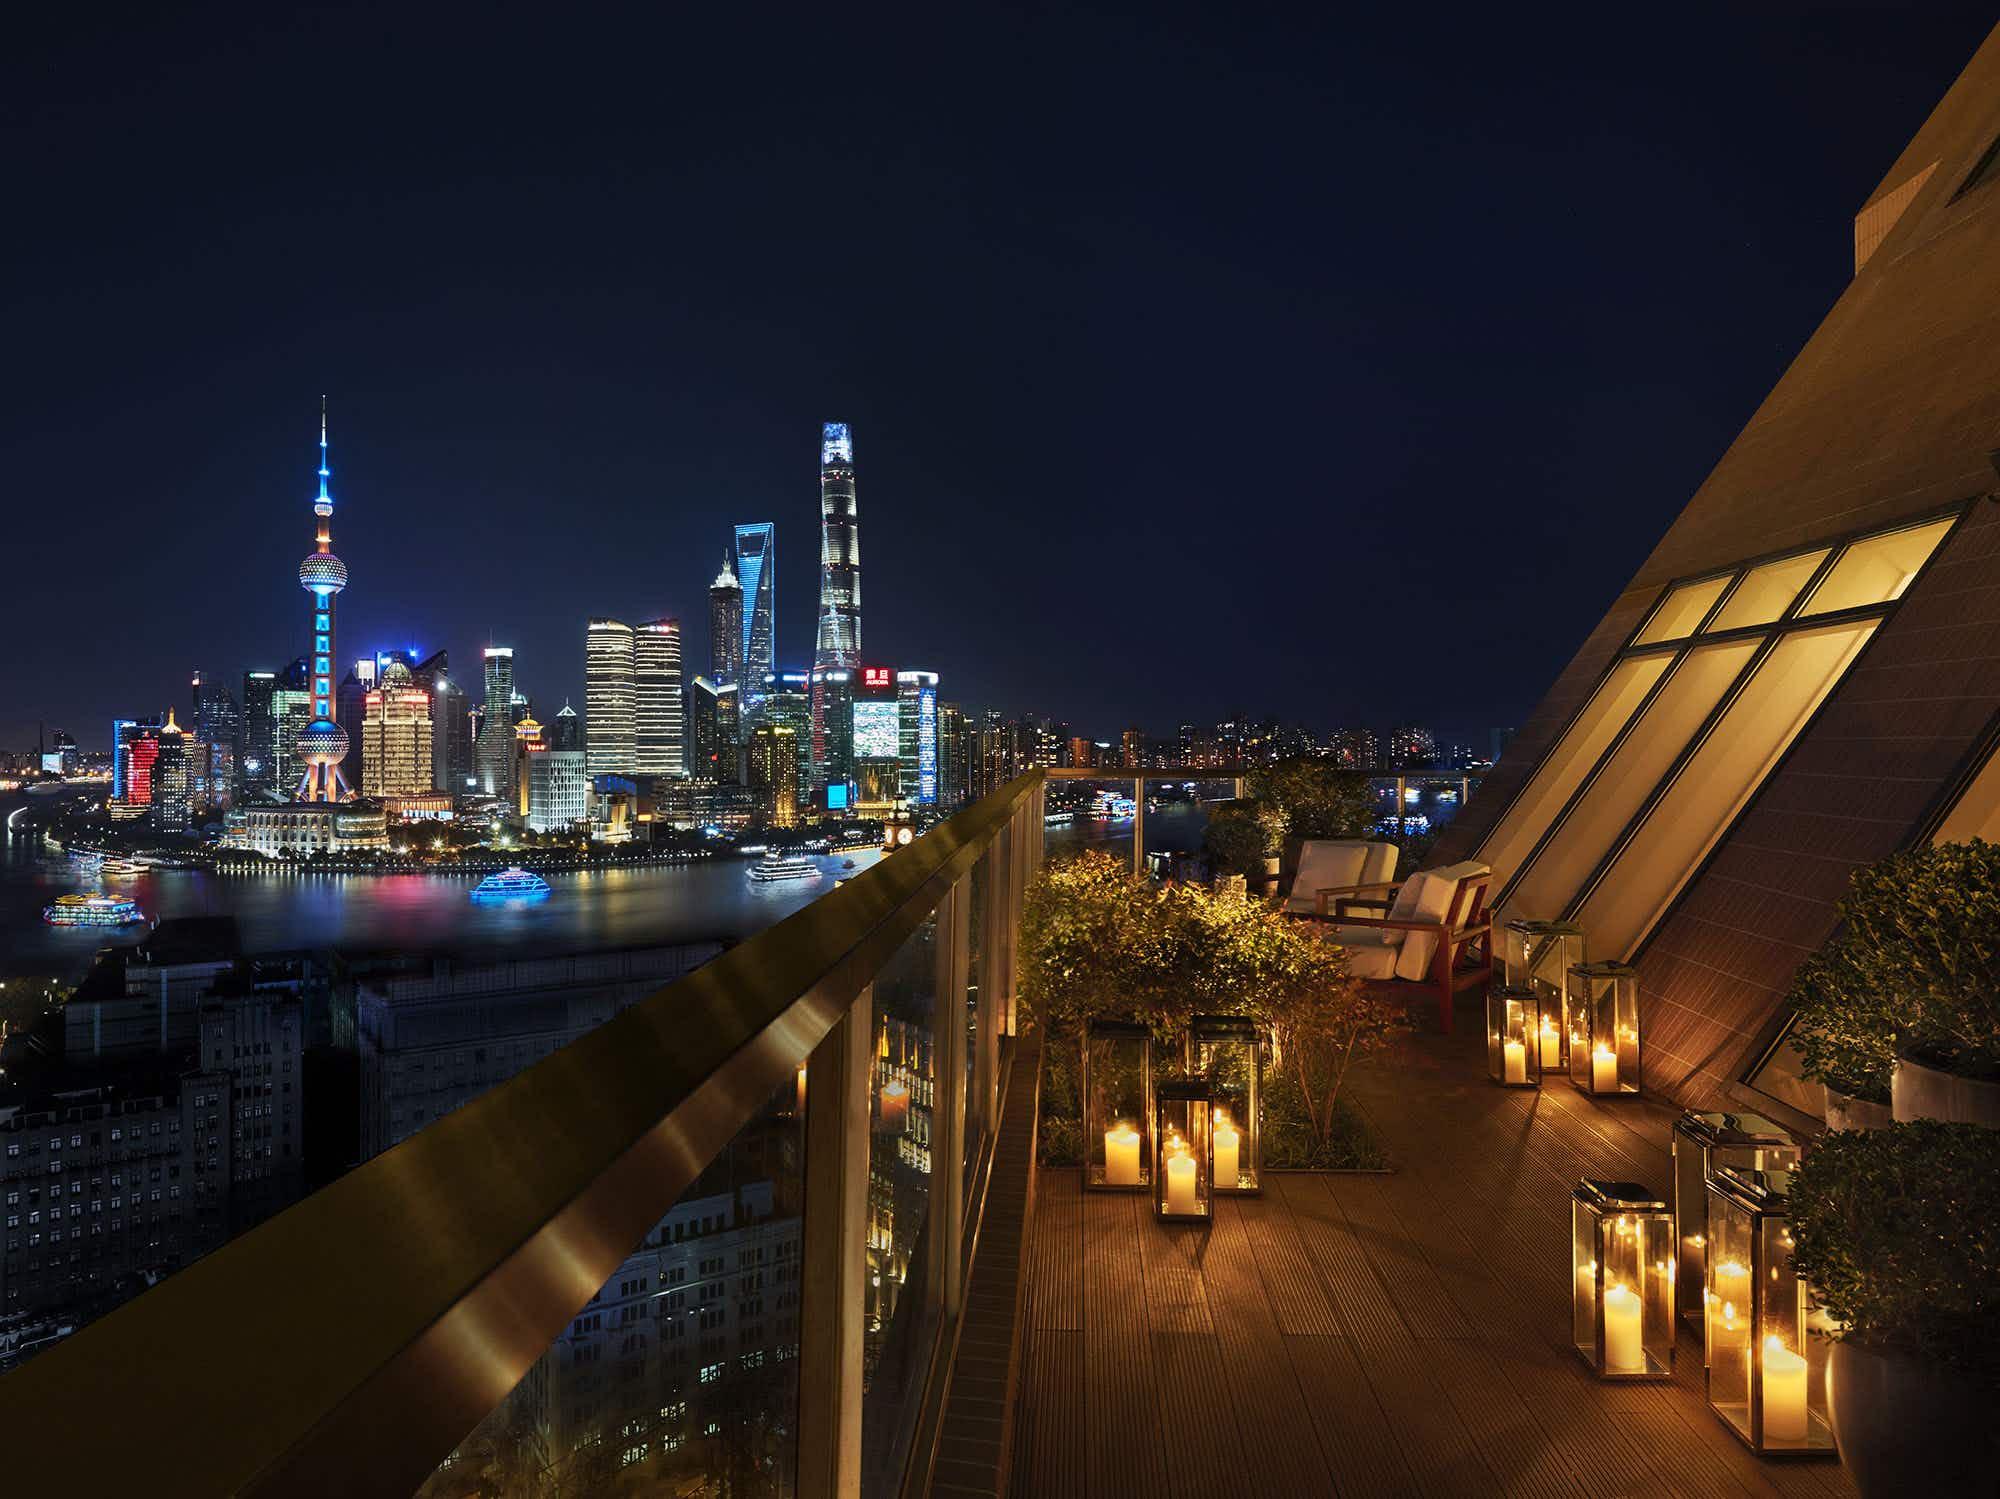 This new Shanghai luxury heritage hotel rocks its own glamorous nightclub